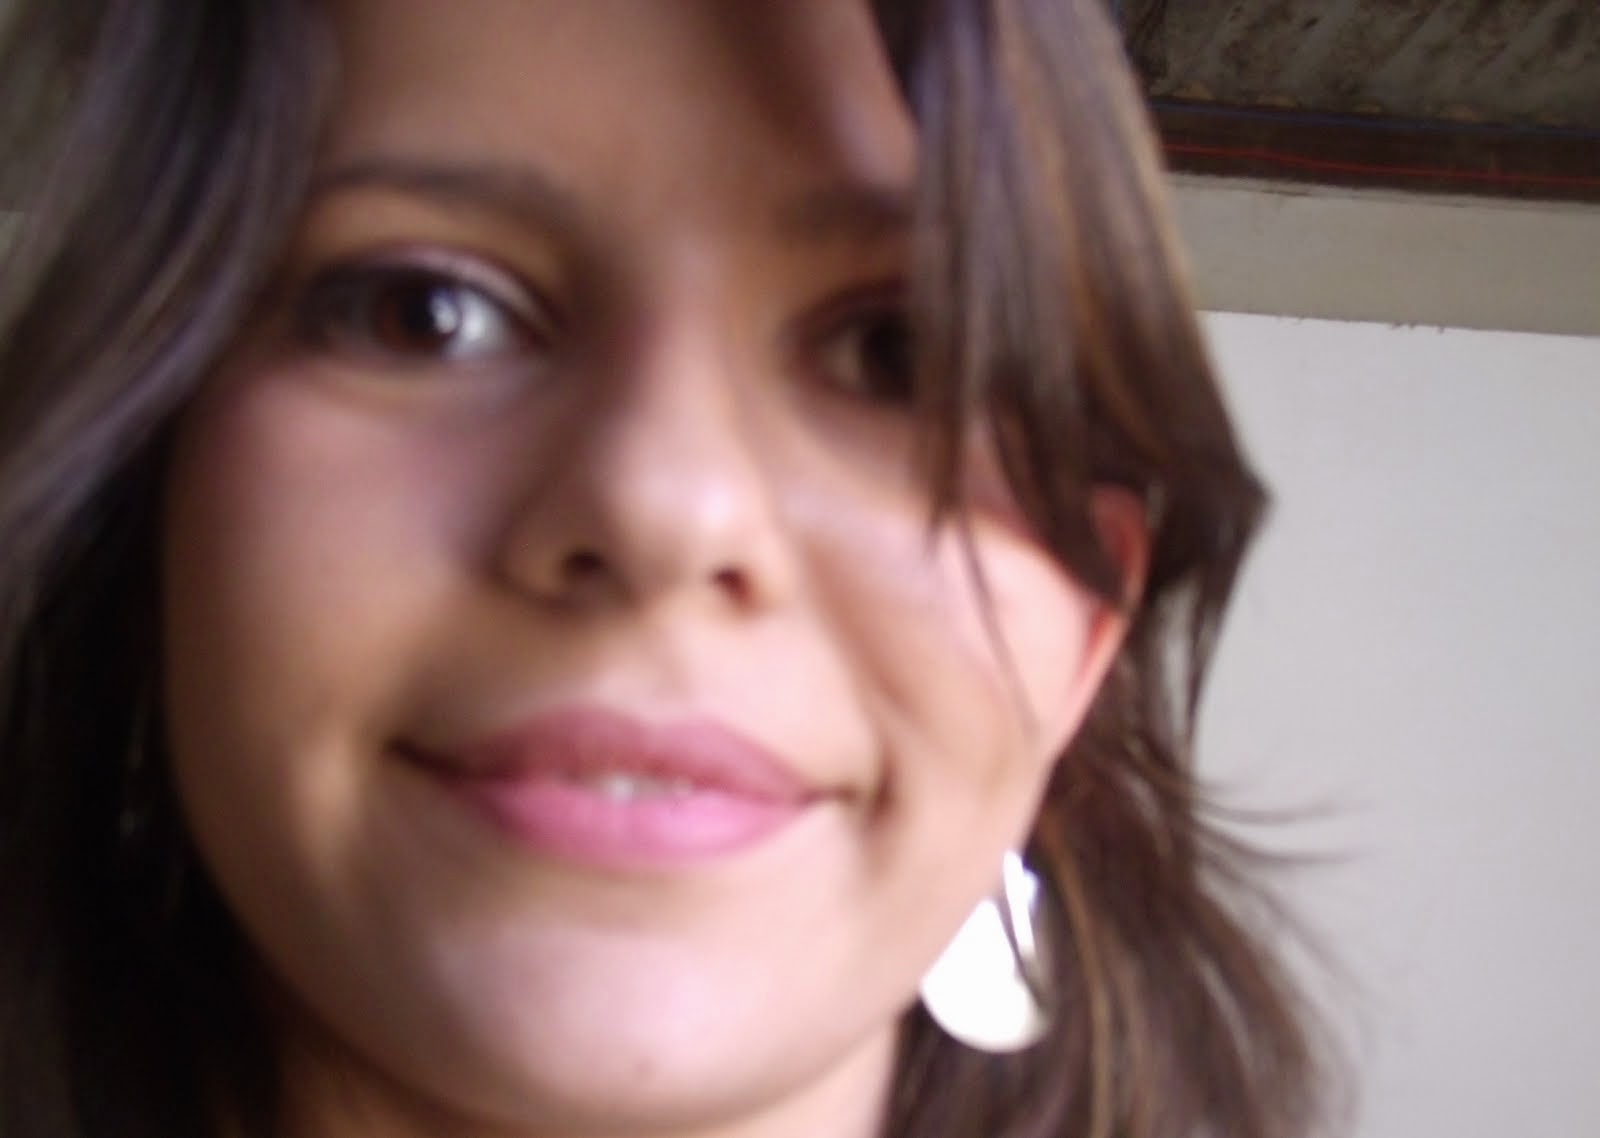 Rafaela Ribeiro